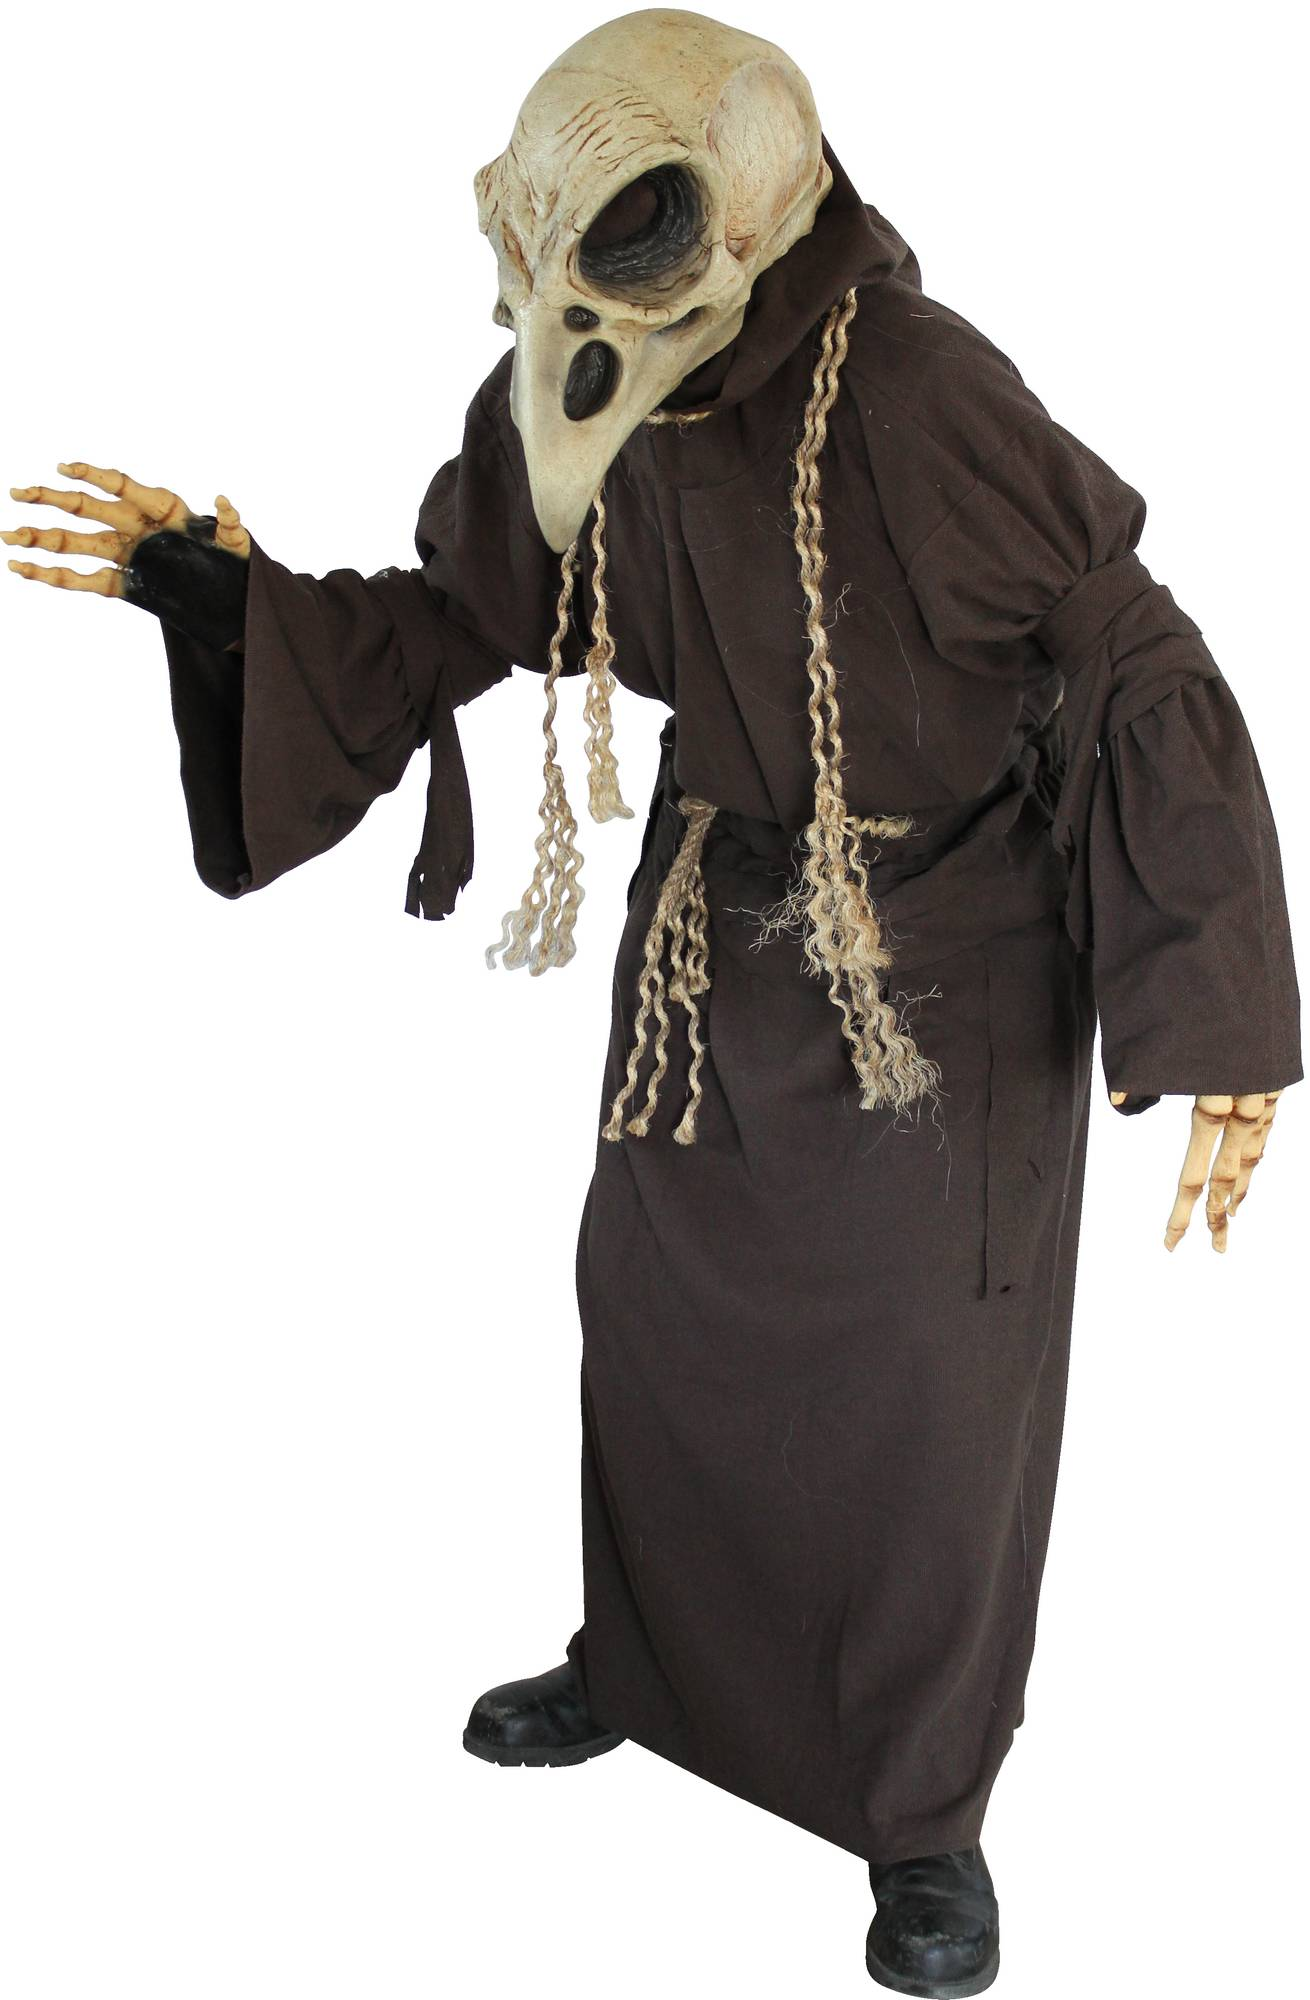 aasgeier skelett kost m f r erwachsene kost me f r erwachsene und g nstige faschingskost me. Black Bedroom Furniture Sets. Home Design Ideas